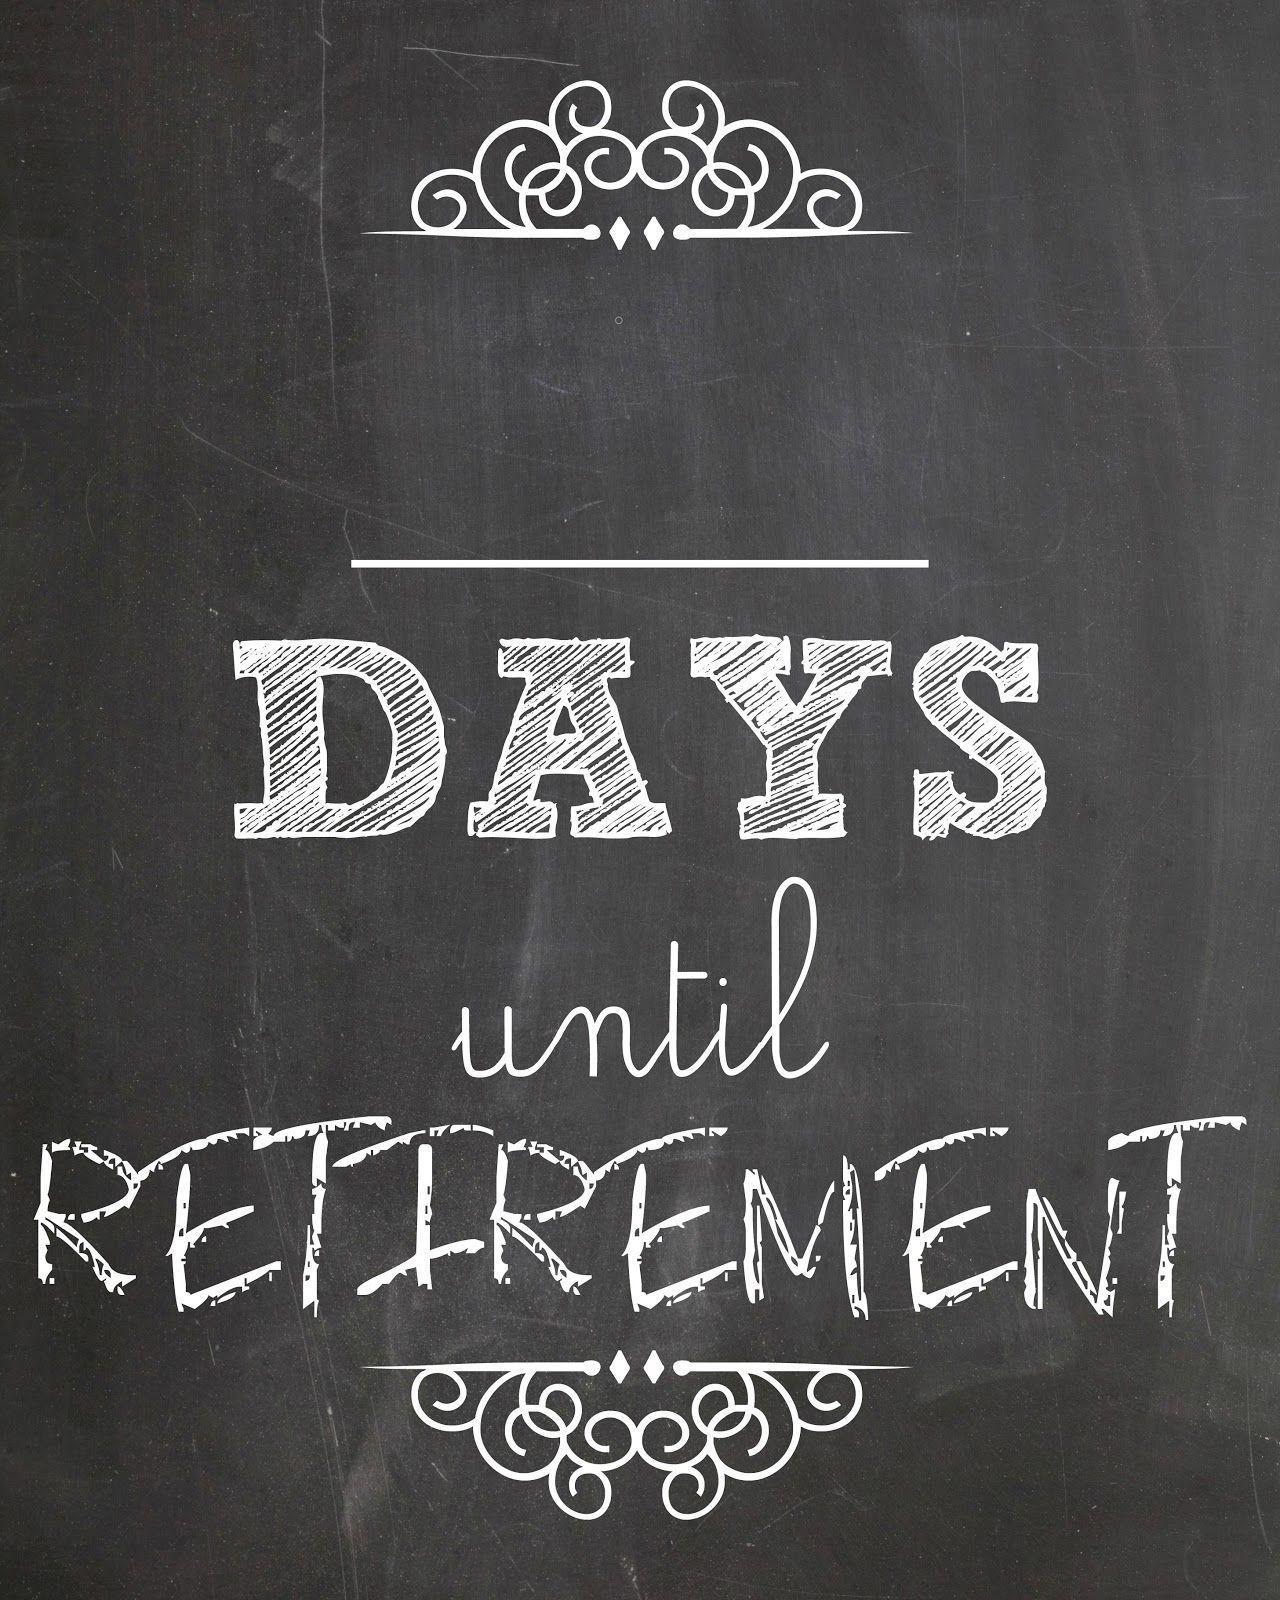 Retirement Countdown Calendar Ideas In 2020 | Retirement